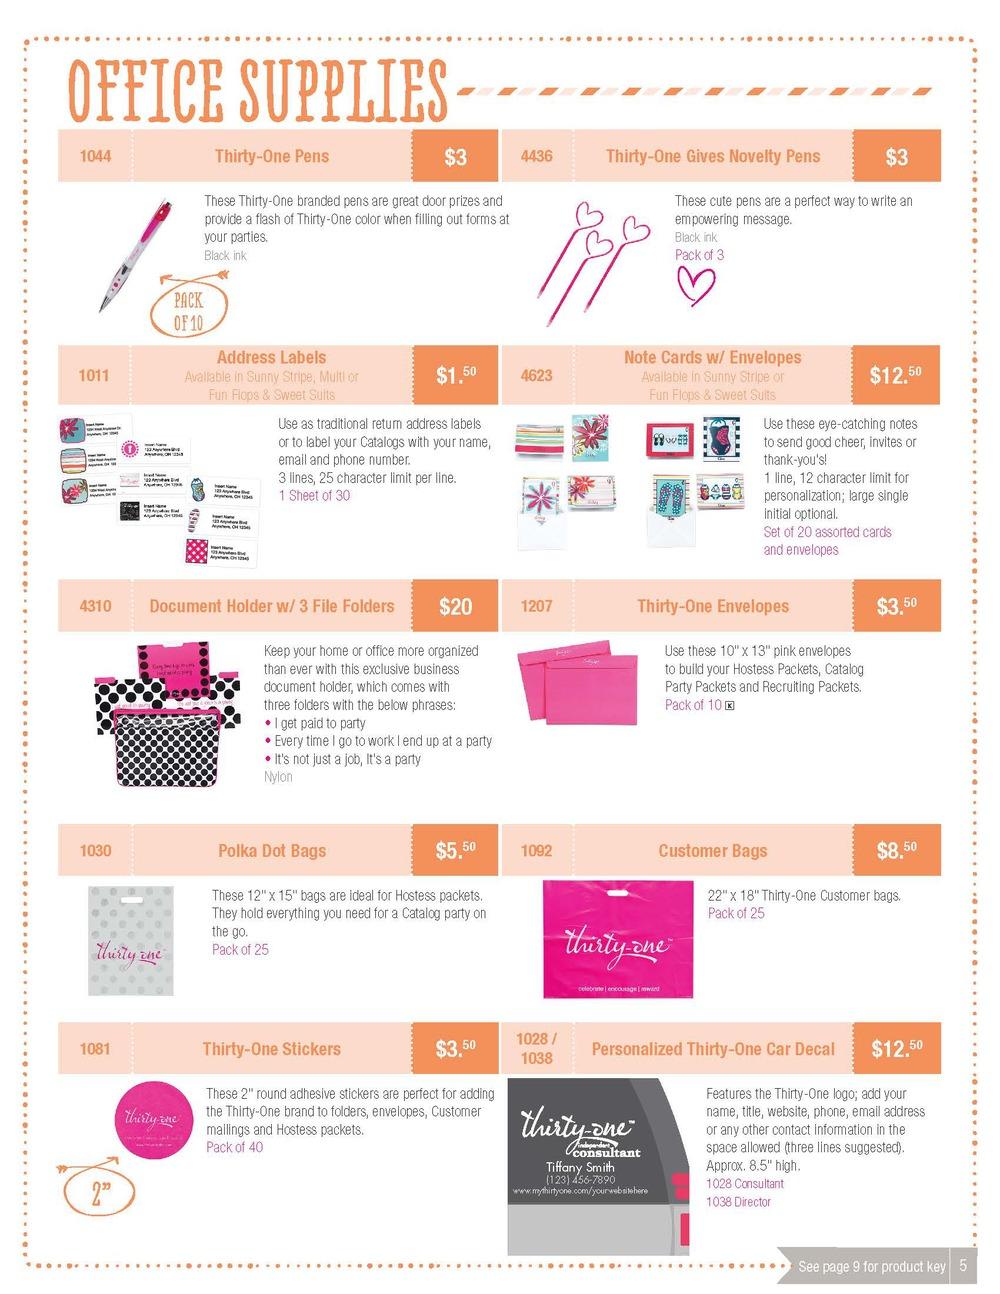 BS_14SU_ShoppingGuide_US_web_Page_5.jpg